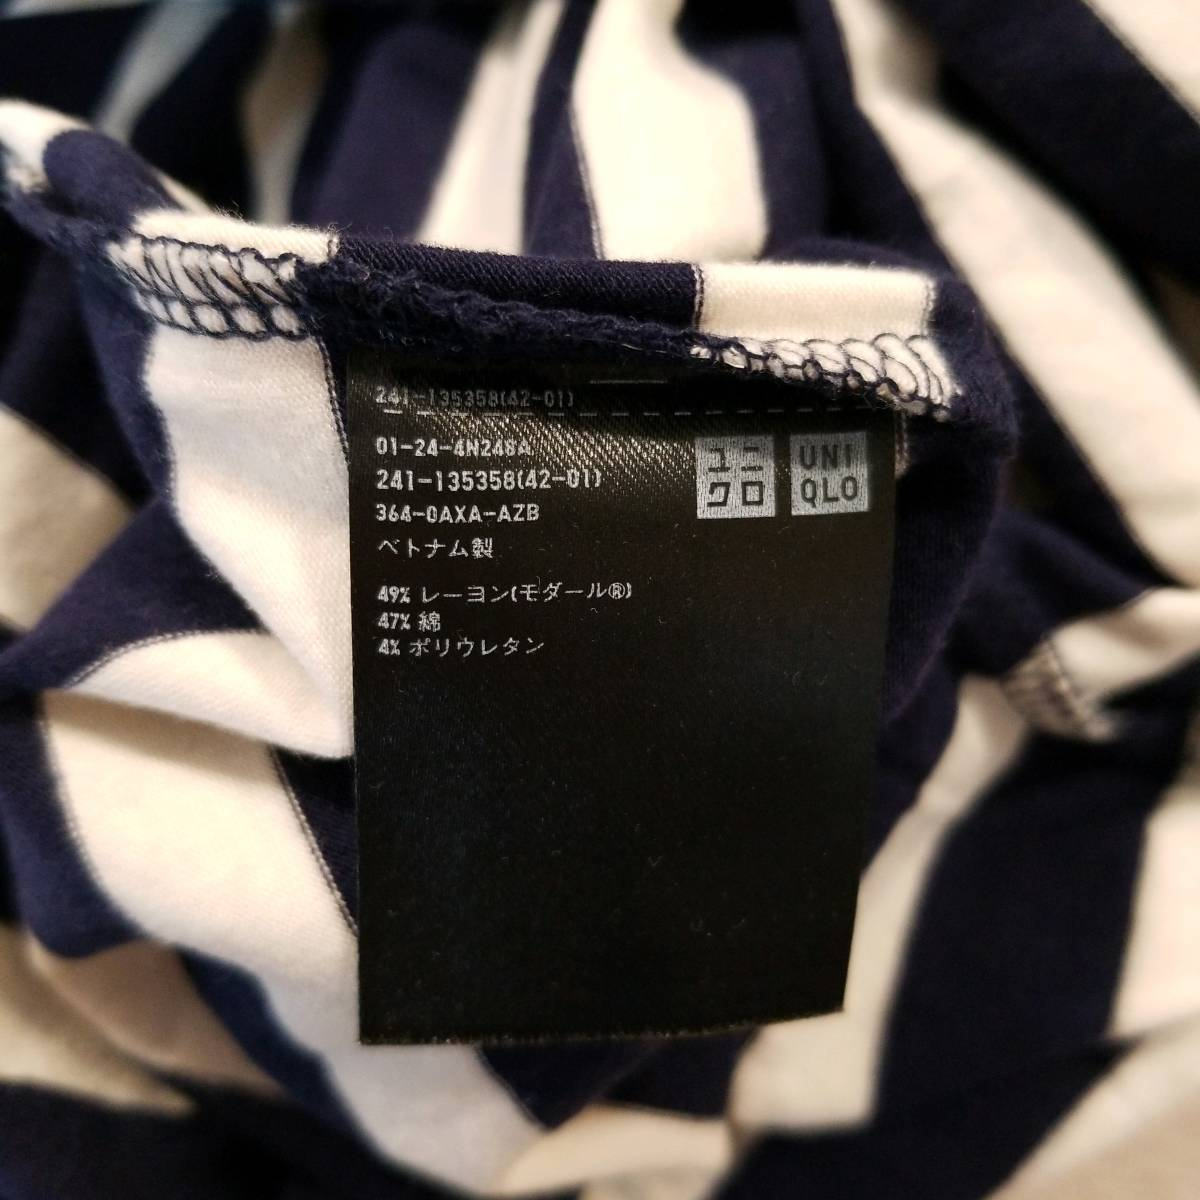 H982 UNIQLO ユニクロ Tシャツ ワンピース S レディース カットソー 半袖 ボーダー柄 ネイビー系 紺系 ..